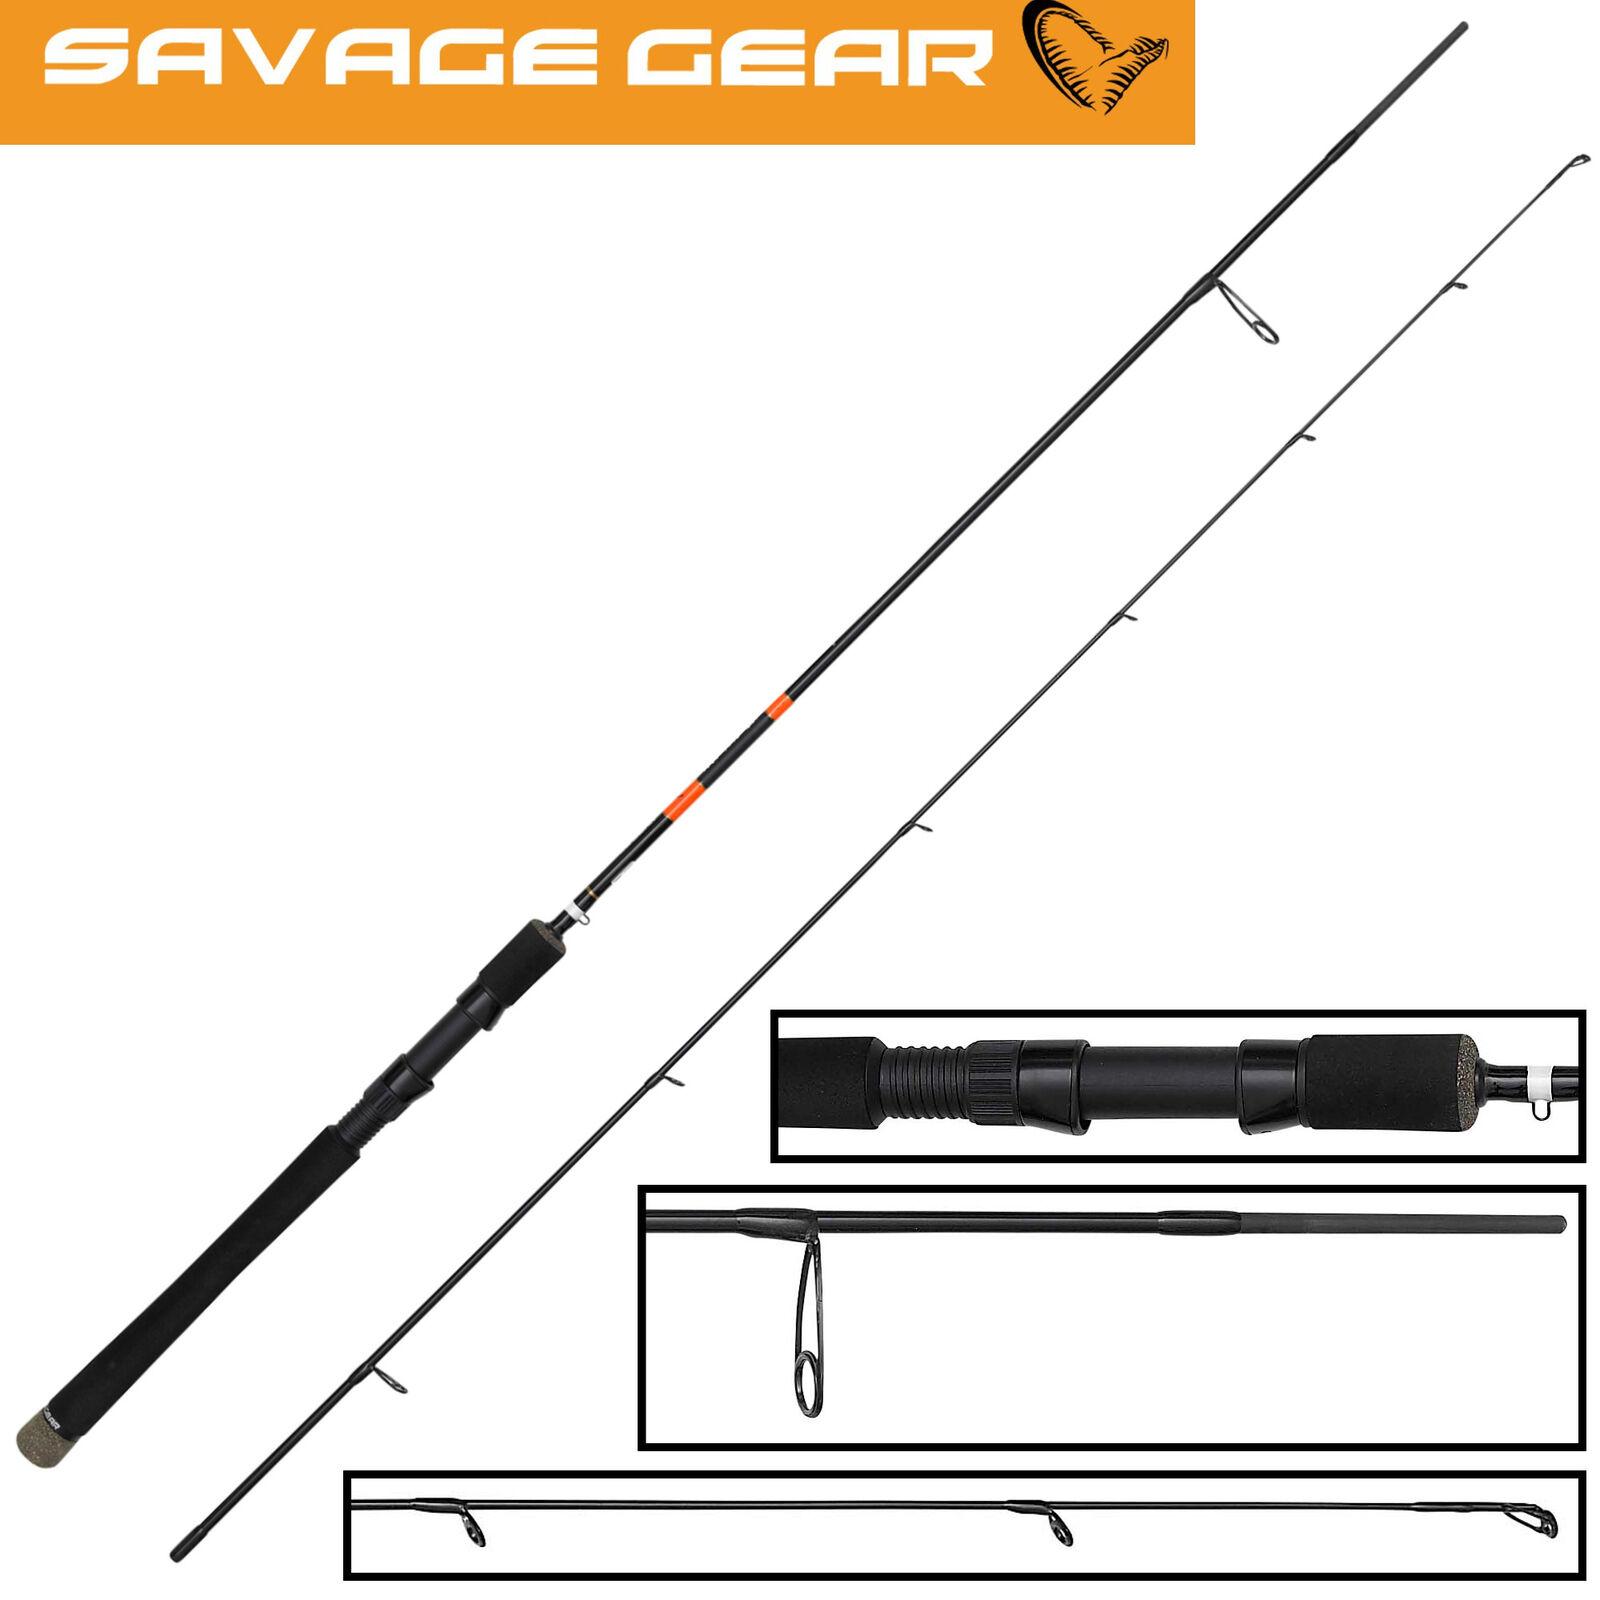 Savage Gear MPP2 Spin 198cm 7-23g - Spinnrute für Barsch, Angelrute, Blinkerrute